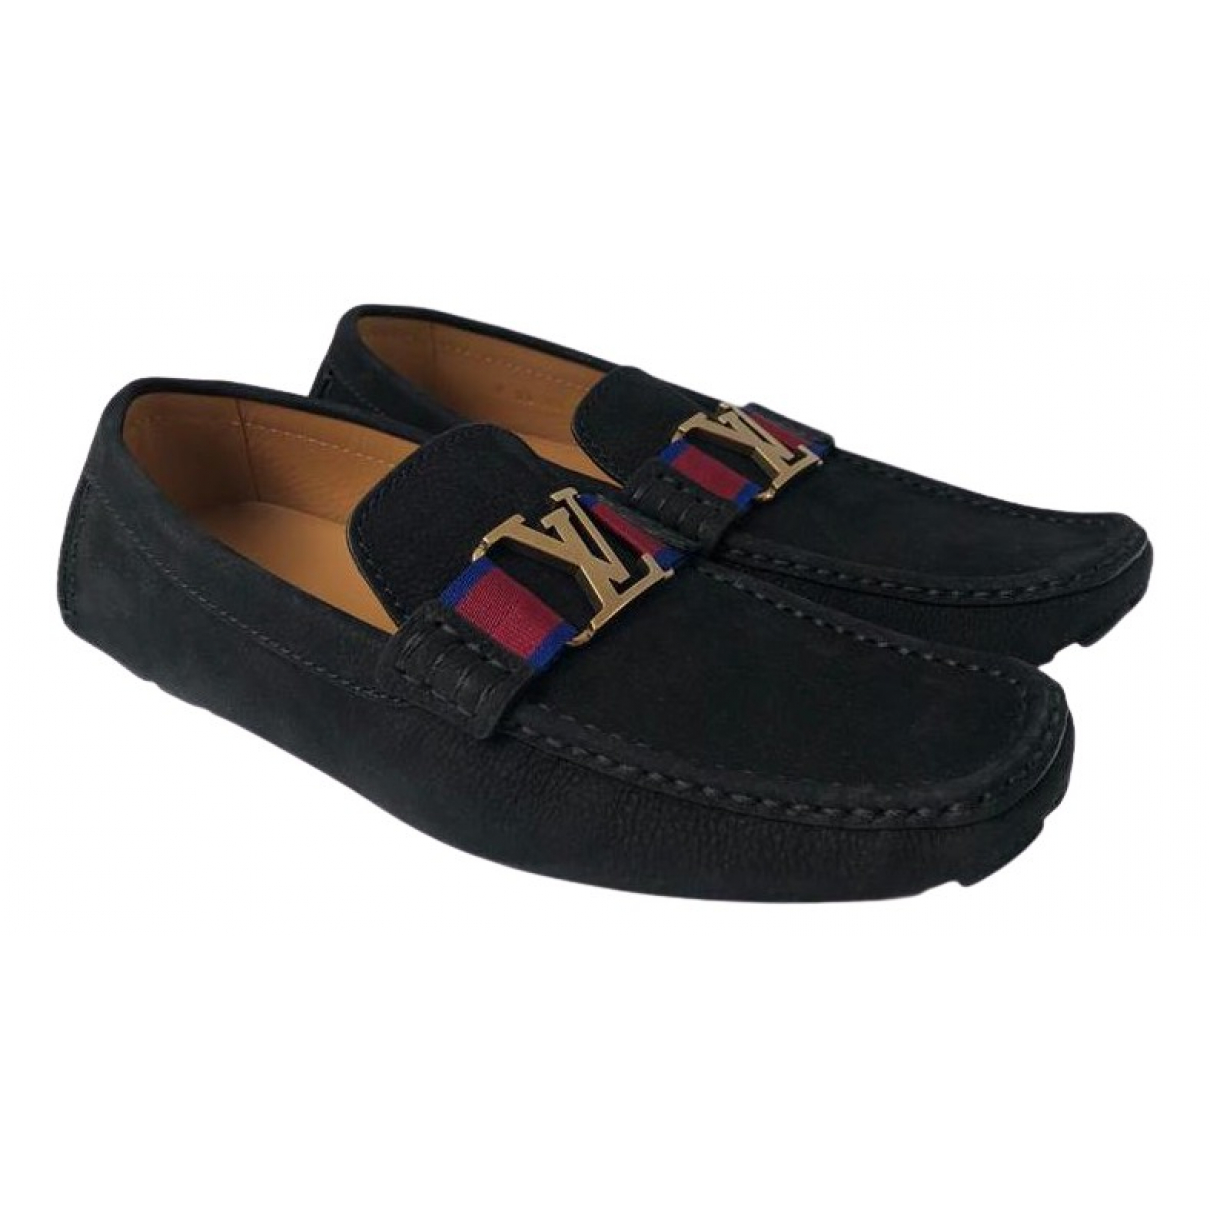 Louis Vuitton \N Black Leather Flats for Men 8.5 UK